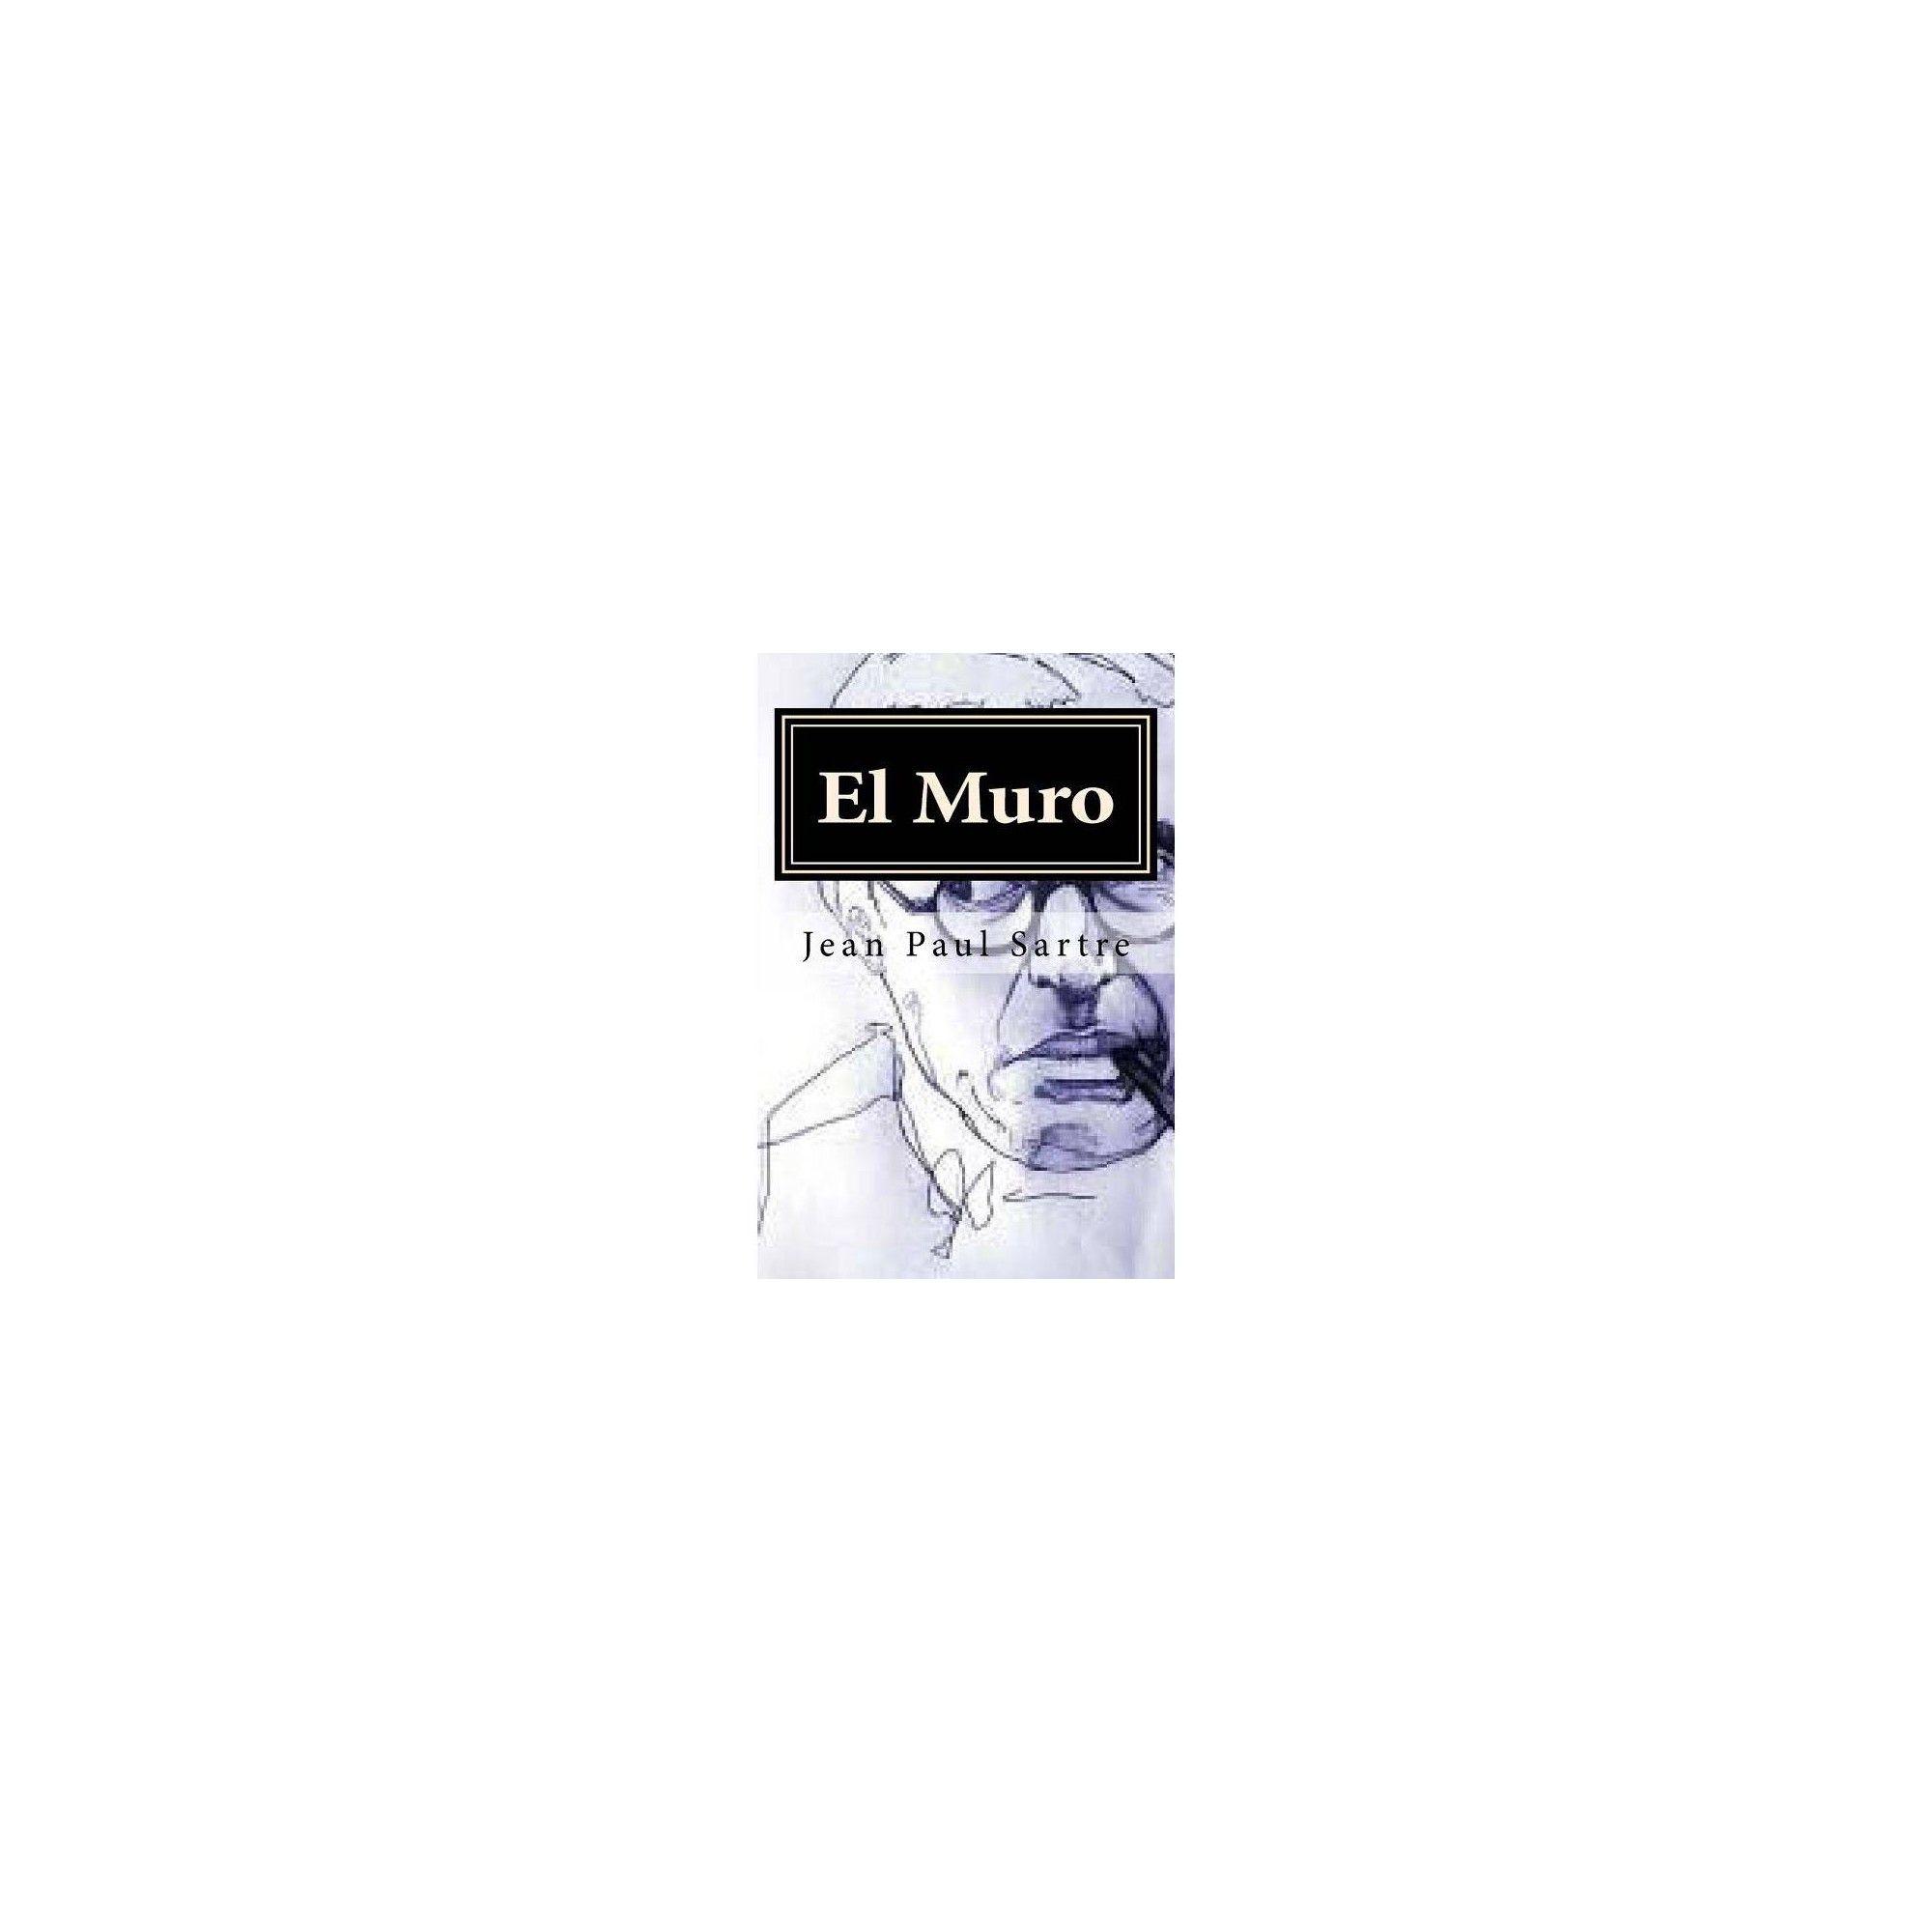 El Muro - by Jean Paul Sartre (Paperback) #jeanpaulsartre